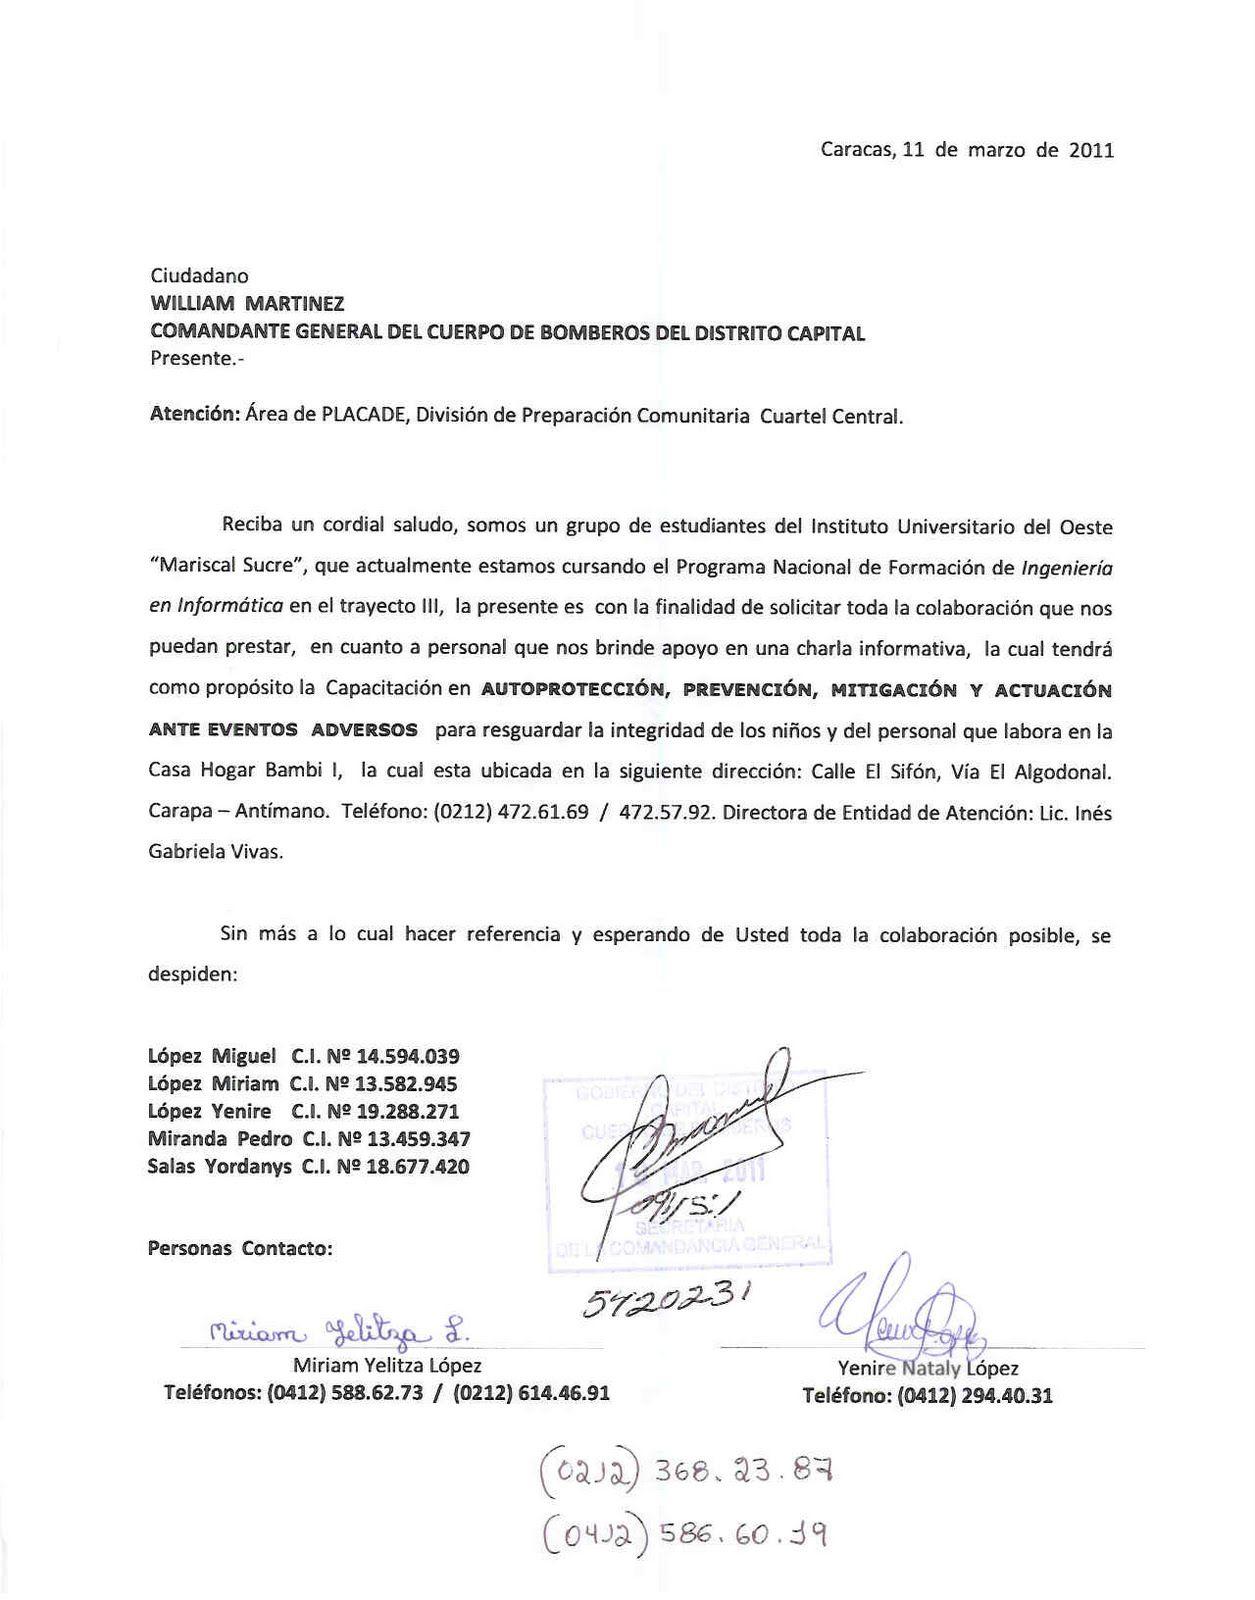 de broglie dissertation